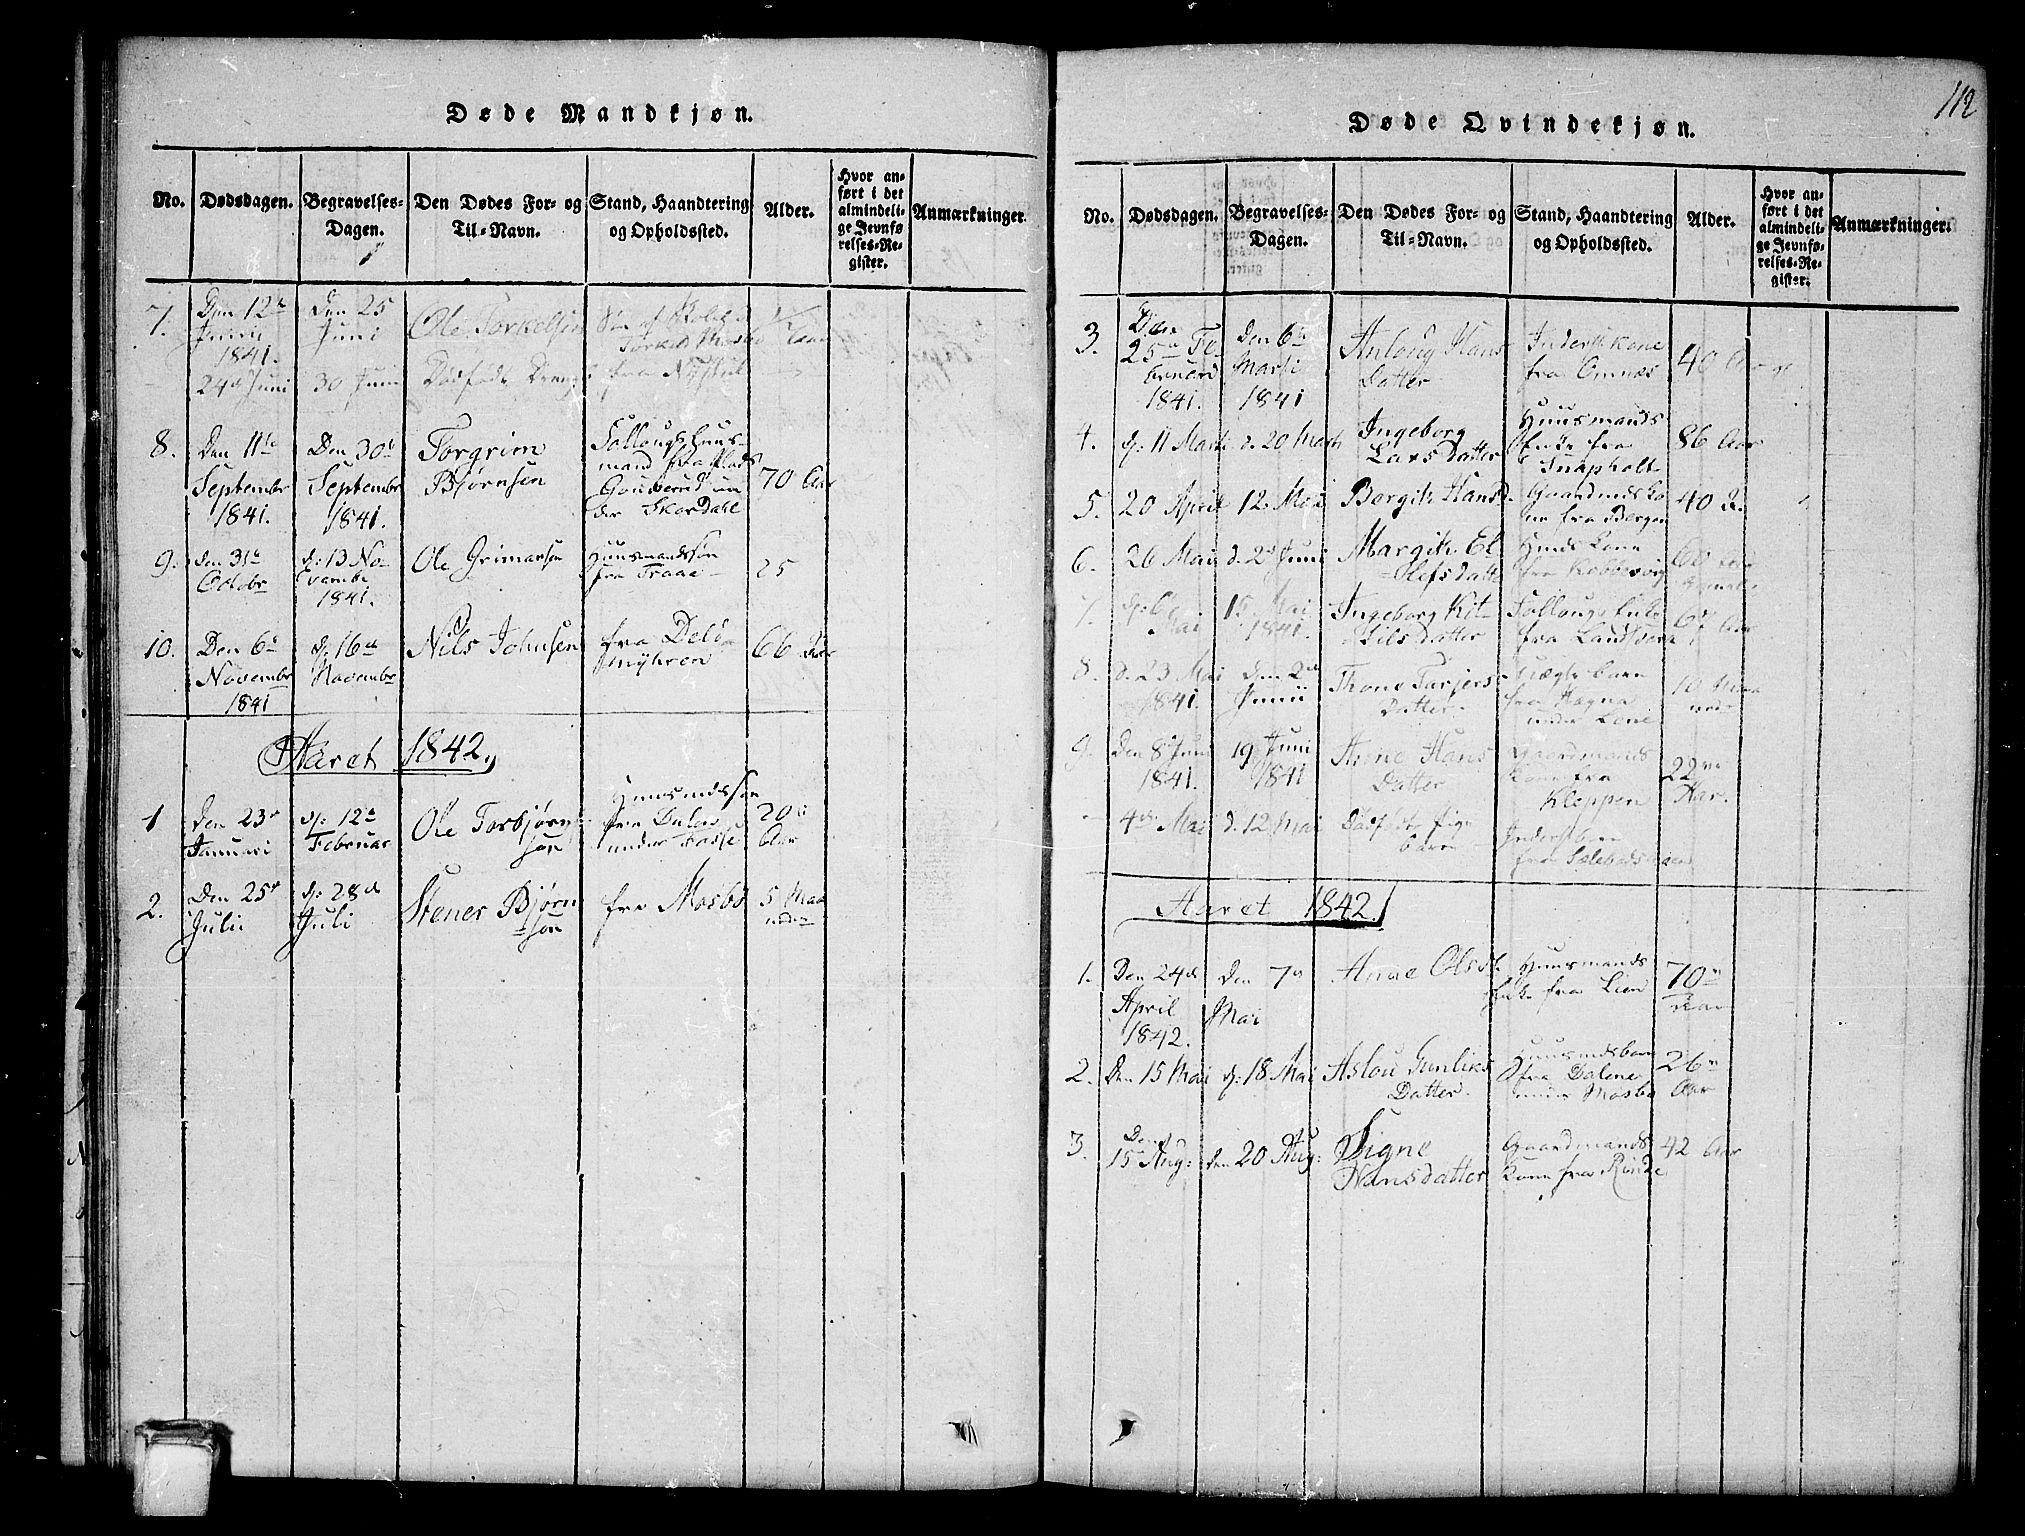 SAKO, Hjartdal kirkebøker, G/Gb/L0001: Klokkerbok nr. II 1, 1815-1842, s. 112